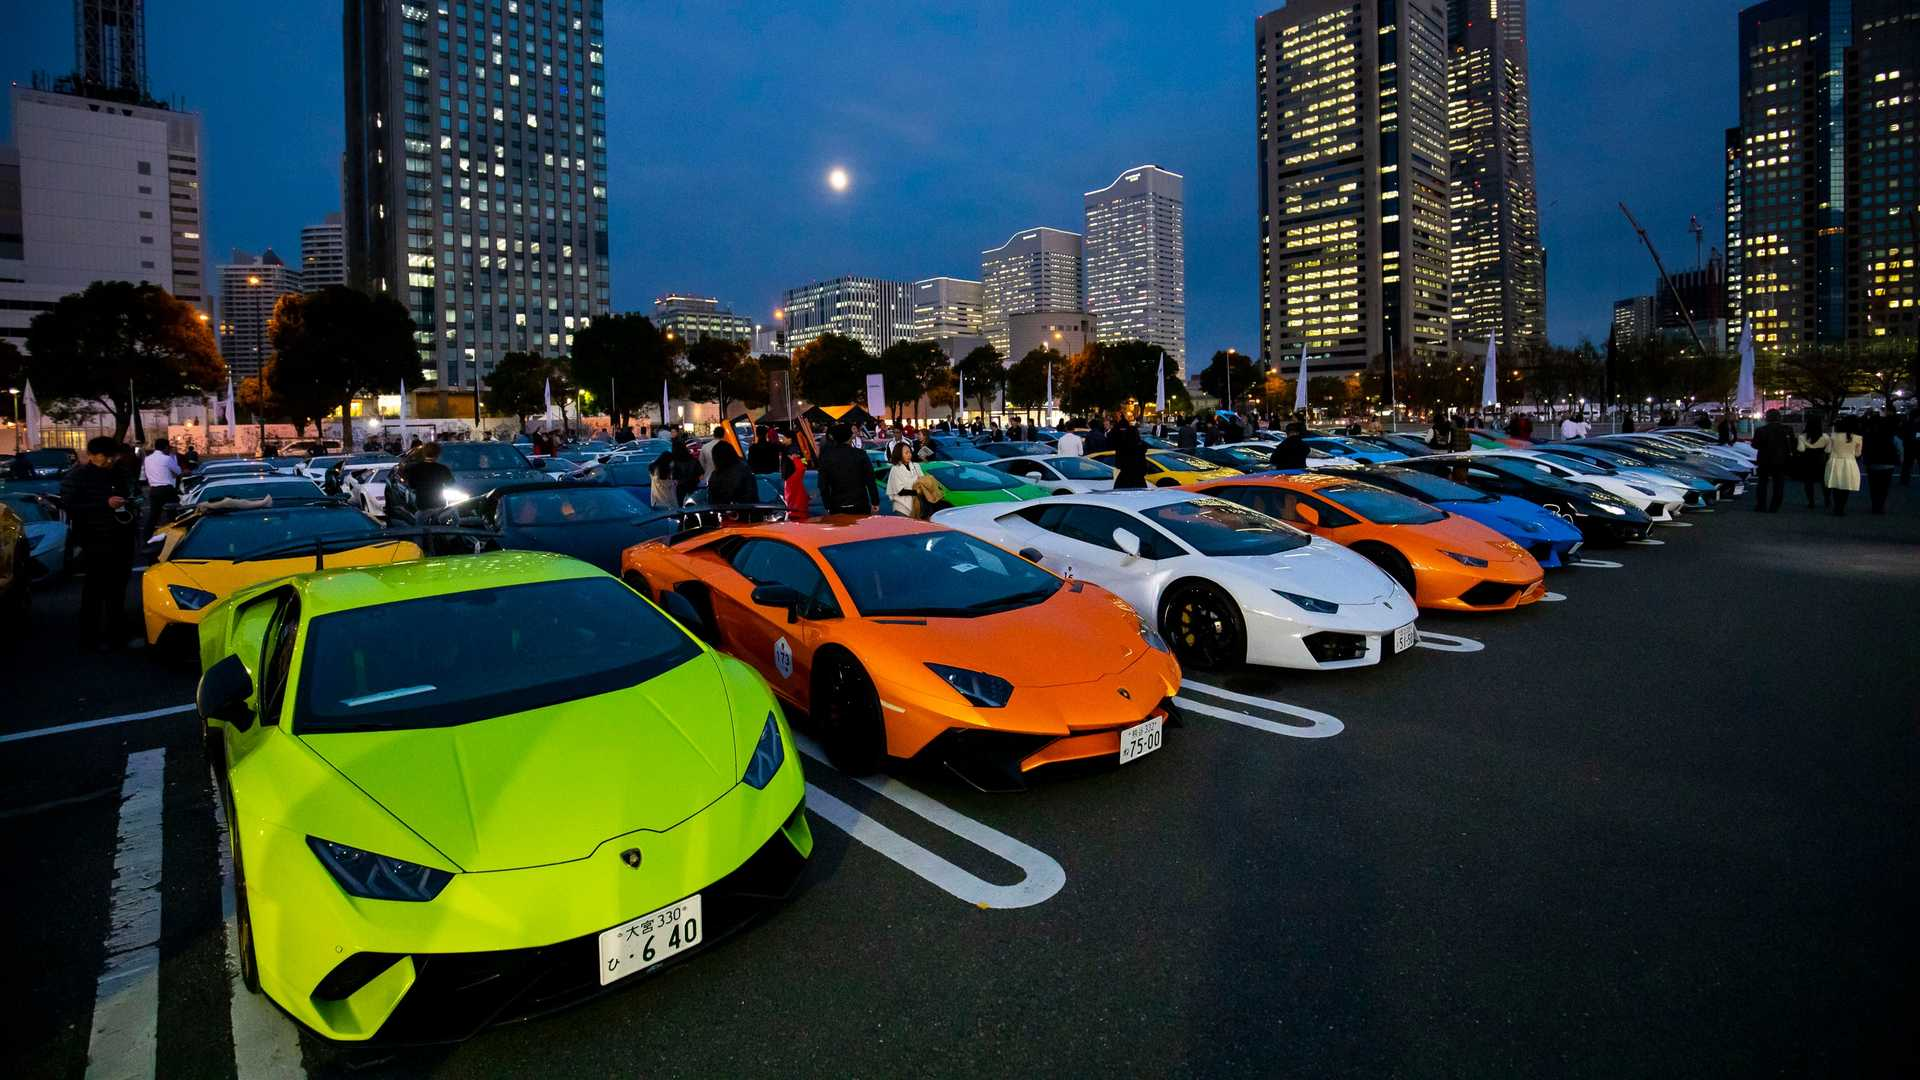 Lamborghini Day Japan Brings 200-Supercar Parade To Yokohama 300a2f935e79